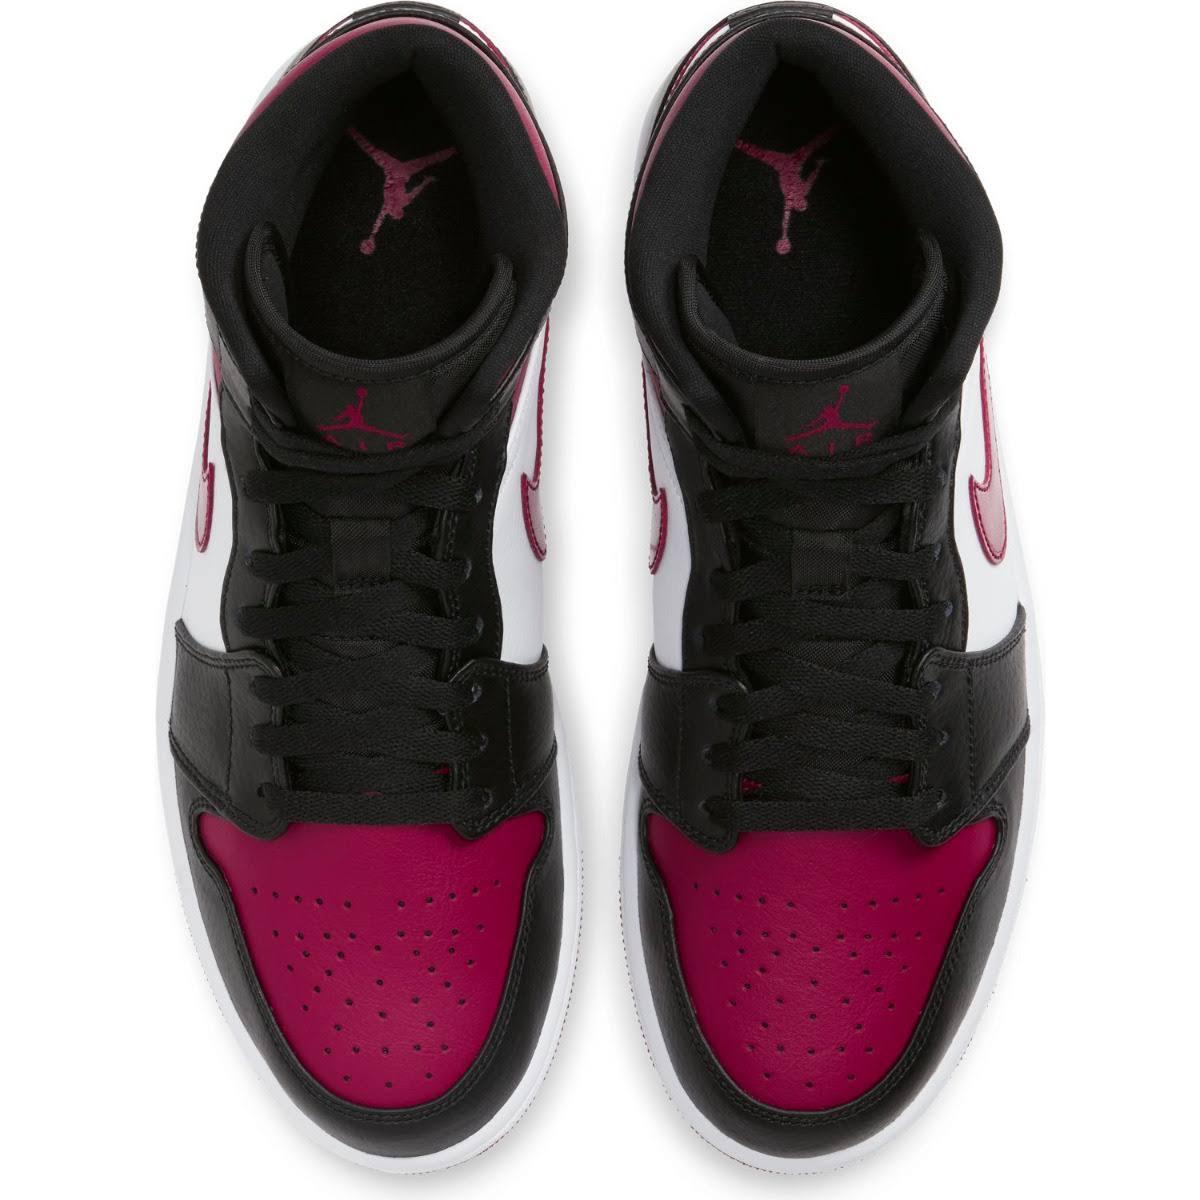 Jordan Air 1 mid, Black